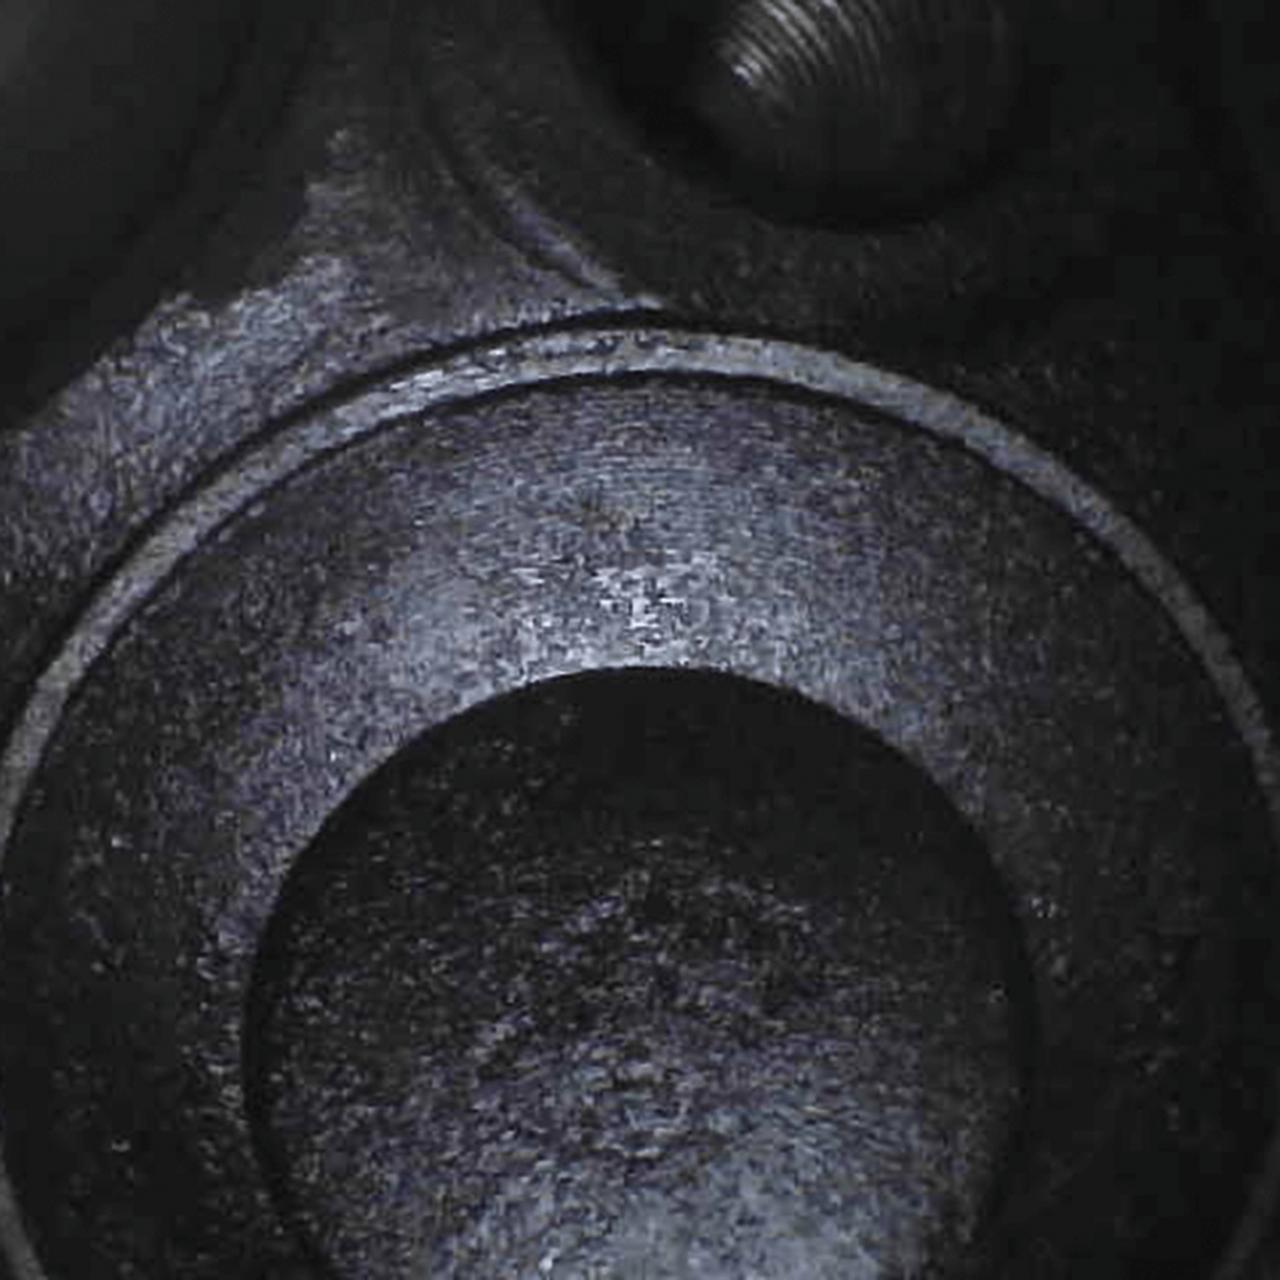 Video-Endoskop Bild 3